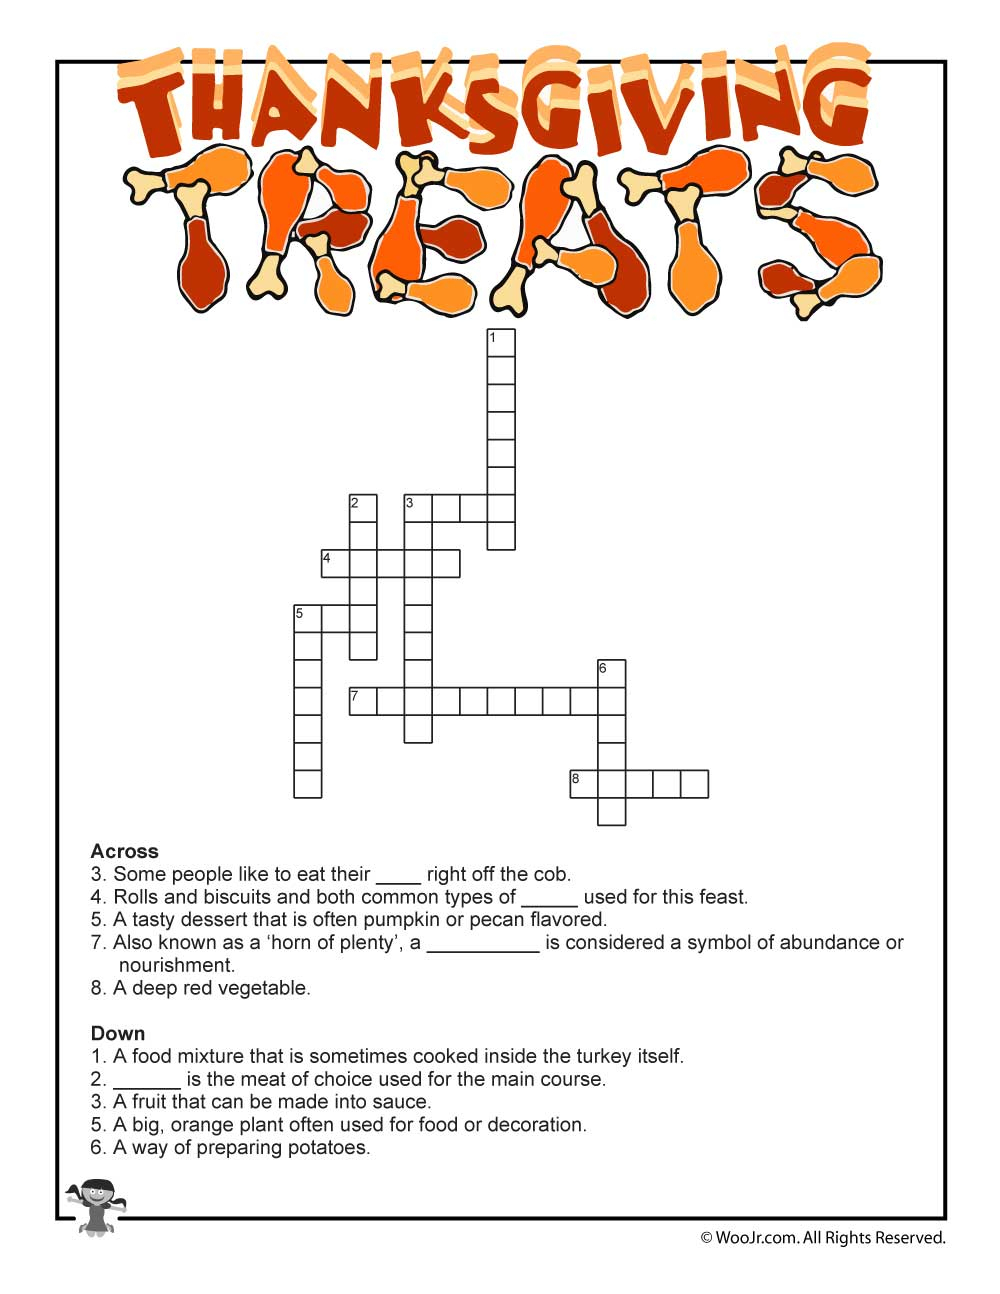 Thanksgiving Crossword Puzzle | Woo! Jr. Kids Activities - Printable Thanksgiving Crossword Puzzles For Adults